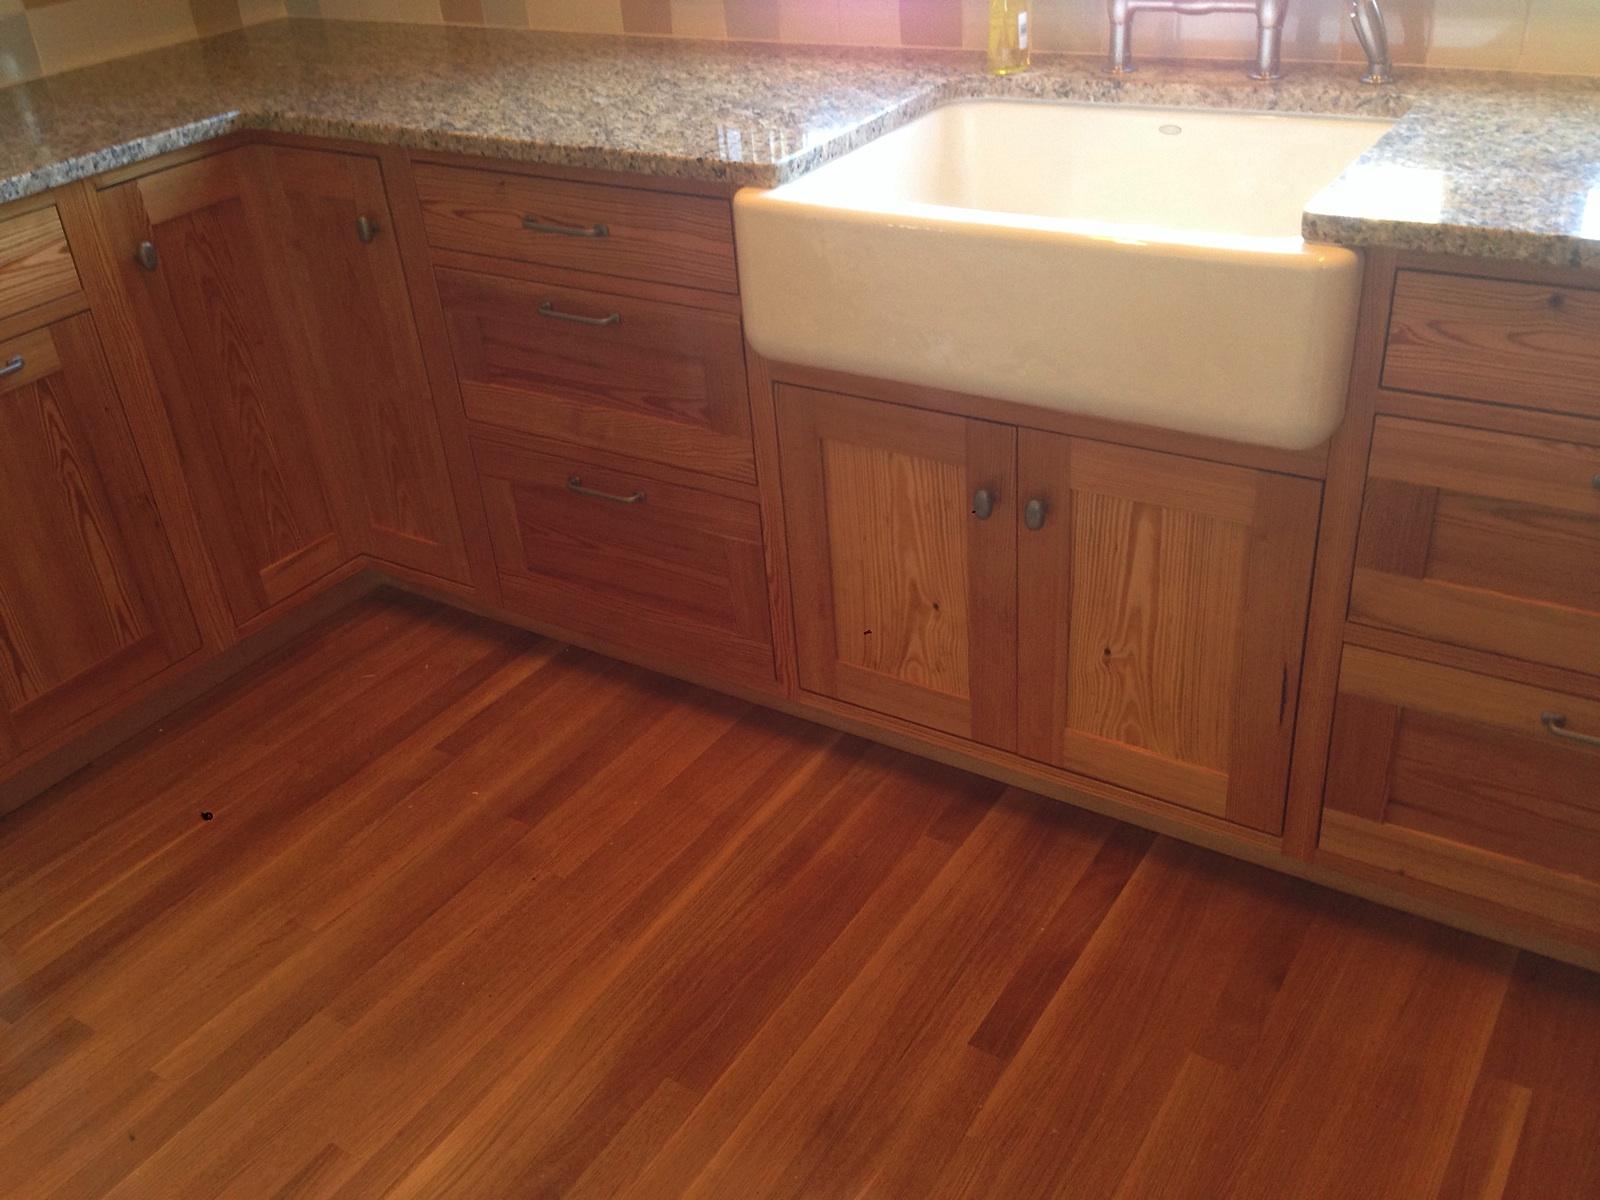 Southern yellow pine kitchen cabinets